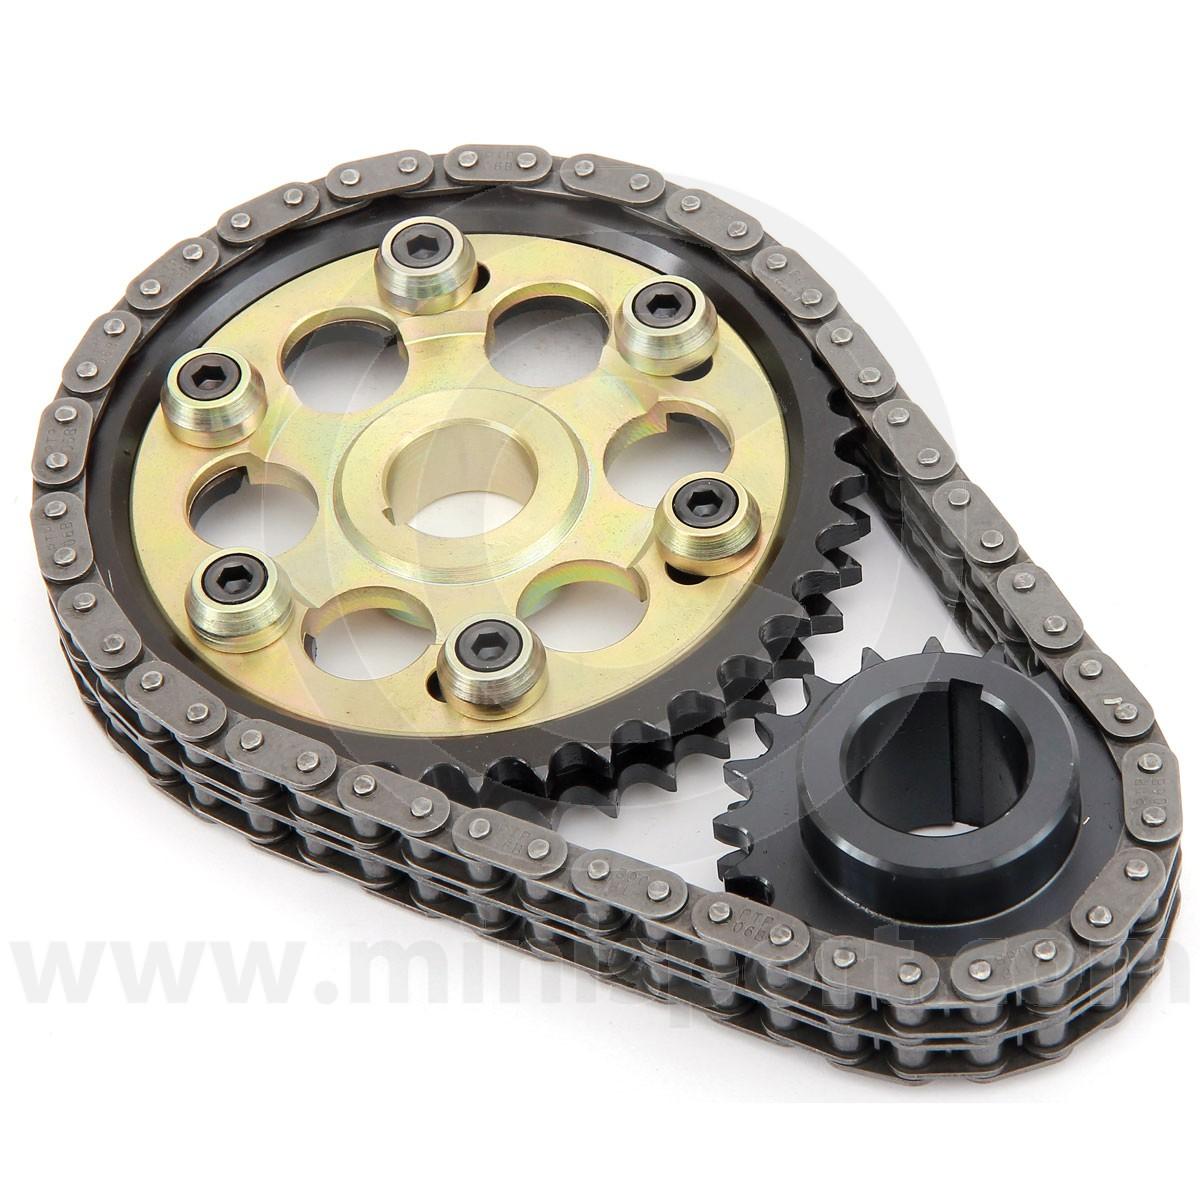 Miniature Timing Belts : Gearsauto